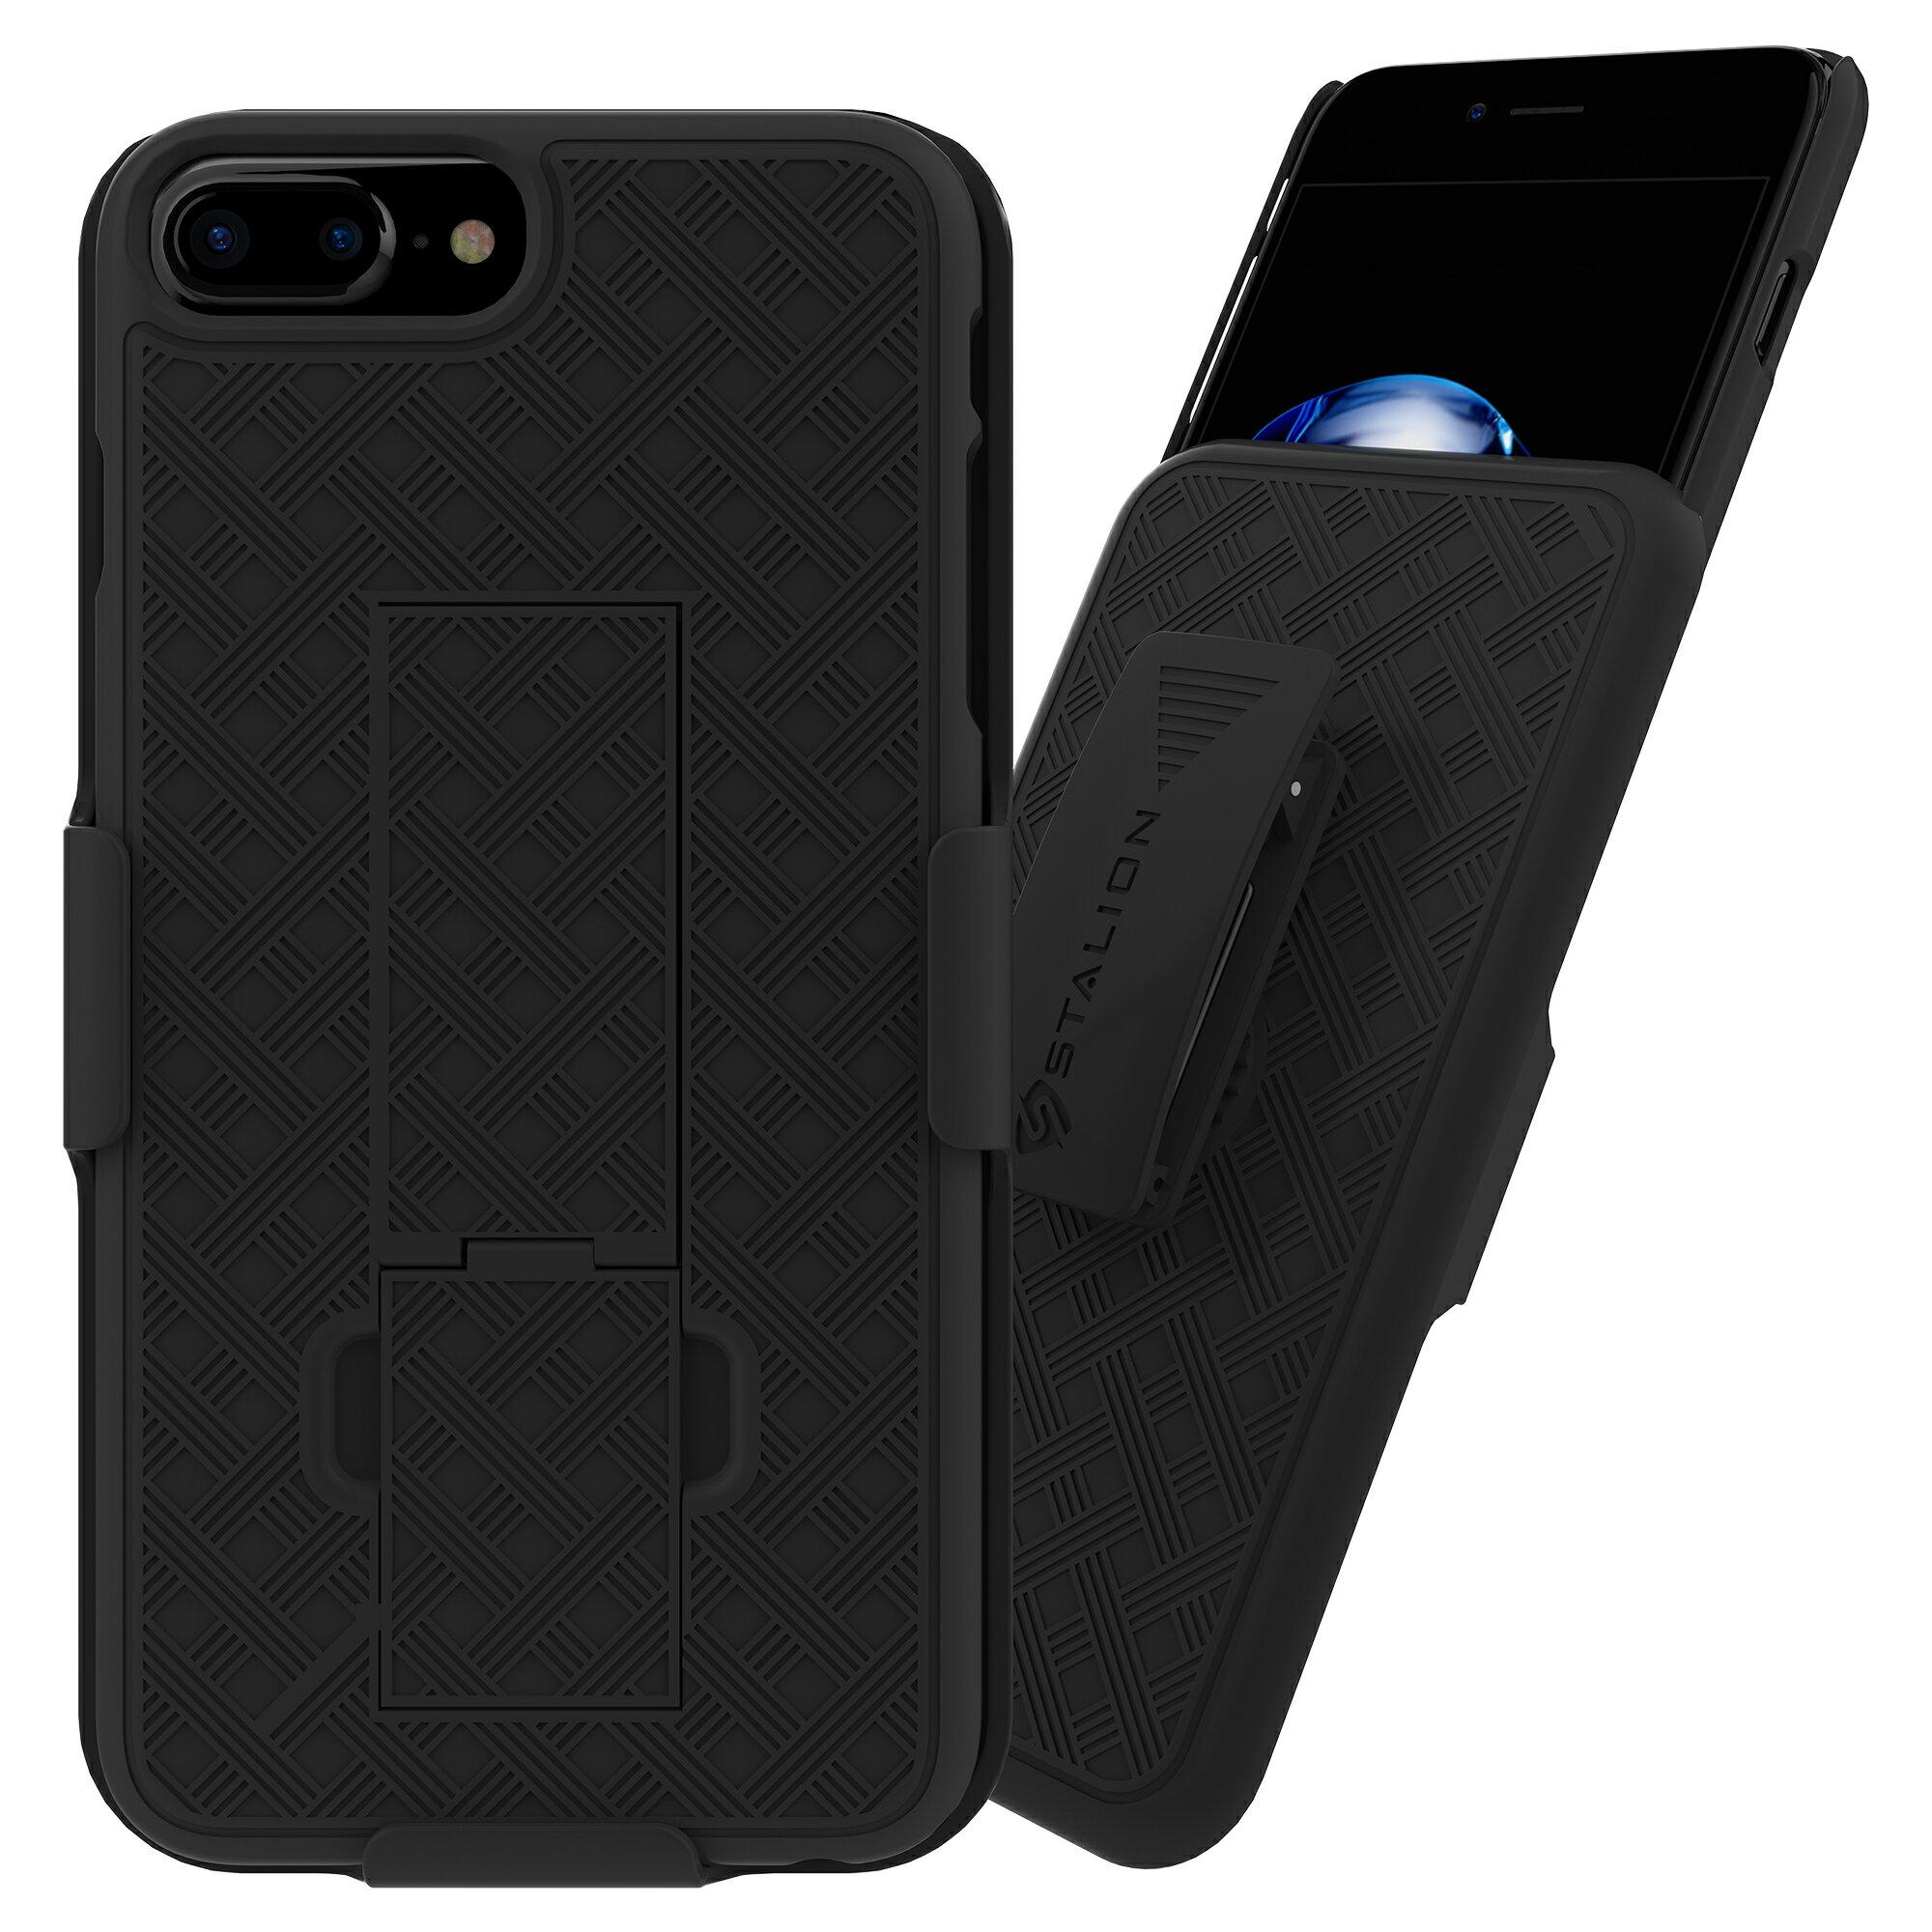 online store ad49d 0cdb0 Apple iPhone 7 Plus Holster Case & Belt Clip Combo